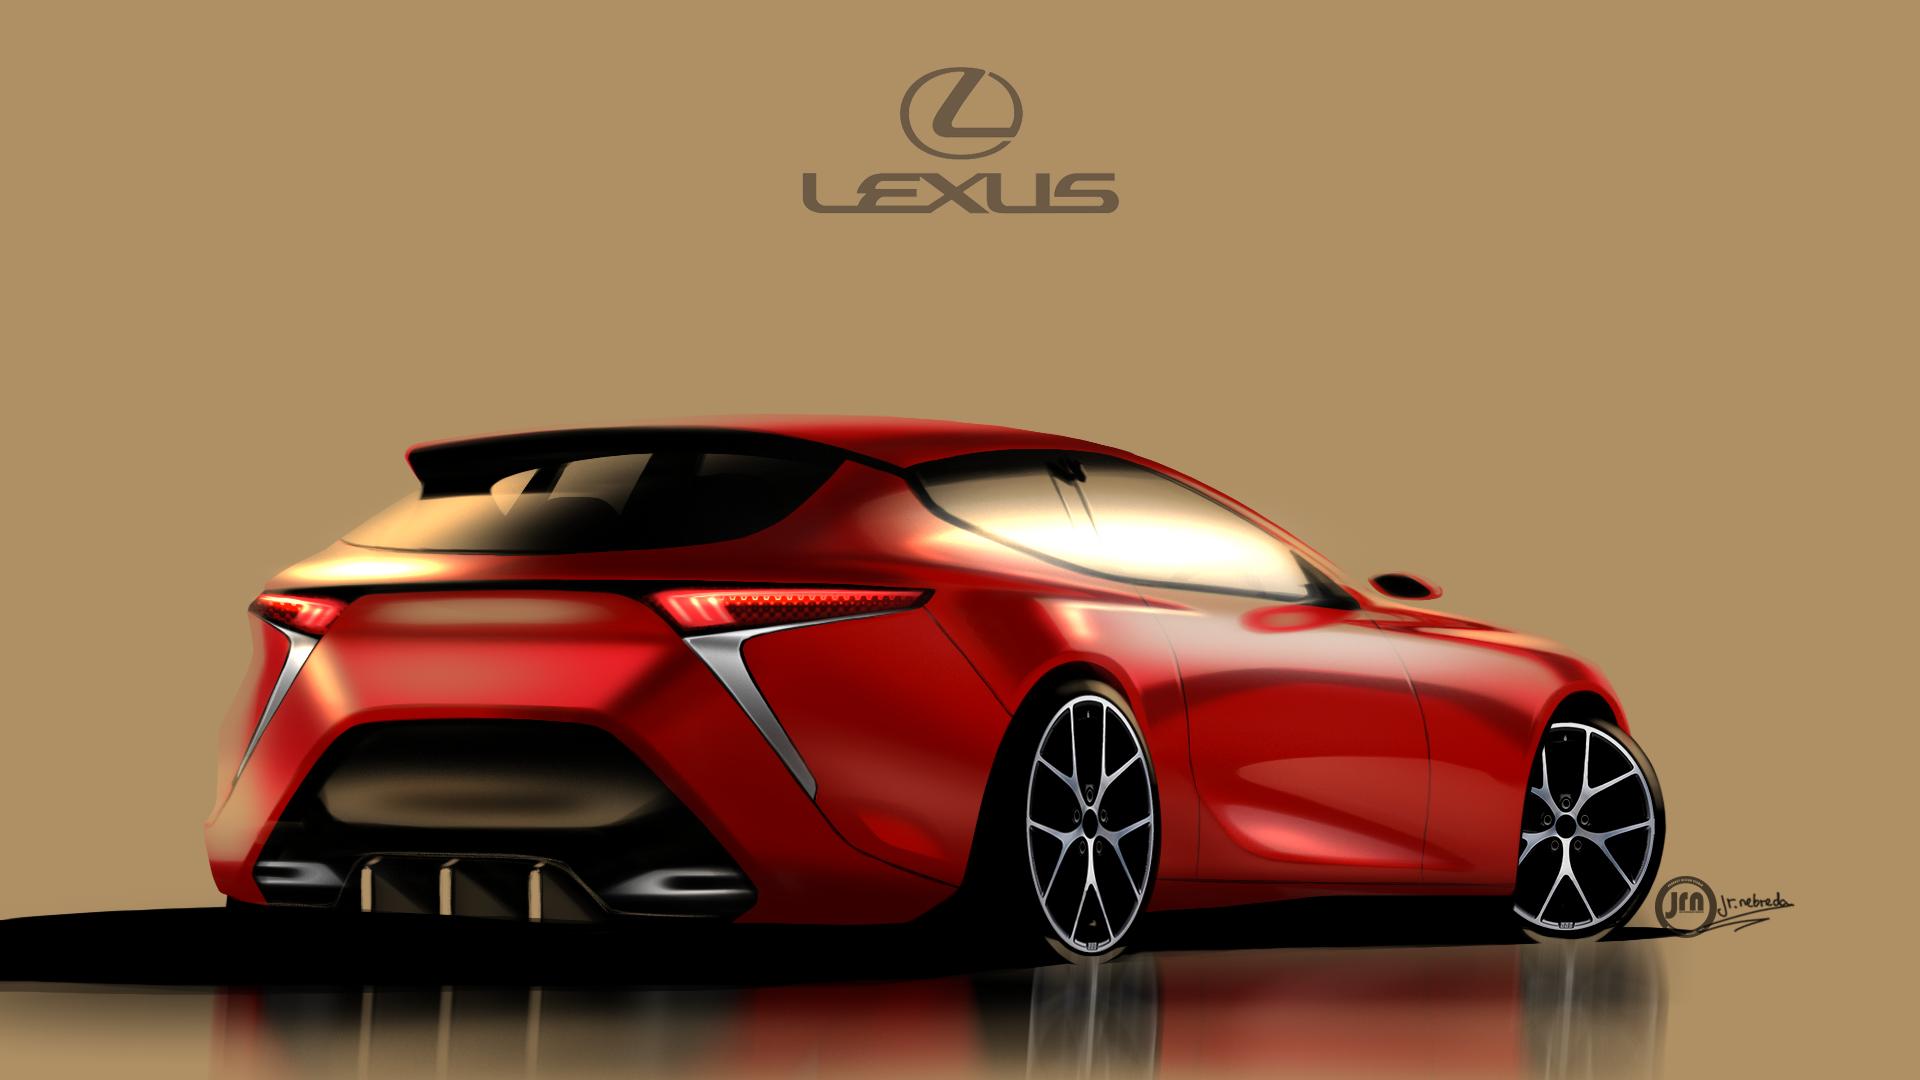 Echa Un Vistazo A Mi Proyecto Behance Lexus Ct Concept Backside Https Www Behance Net Gallery 57794717 Lexus Ct Concept Lexus Car Inspiration New Engine